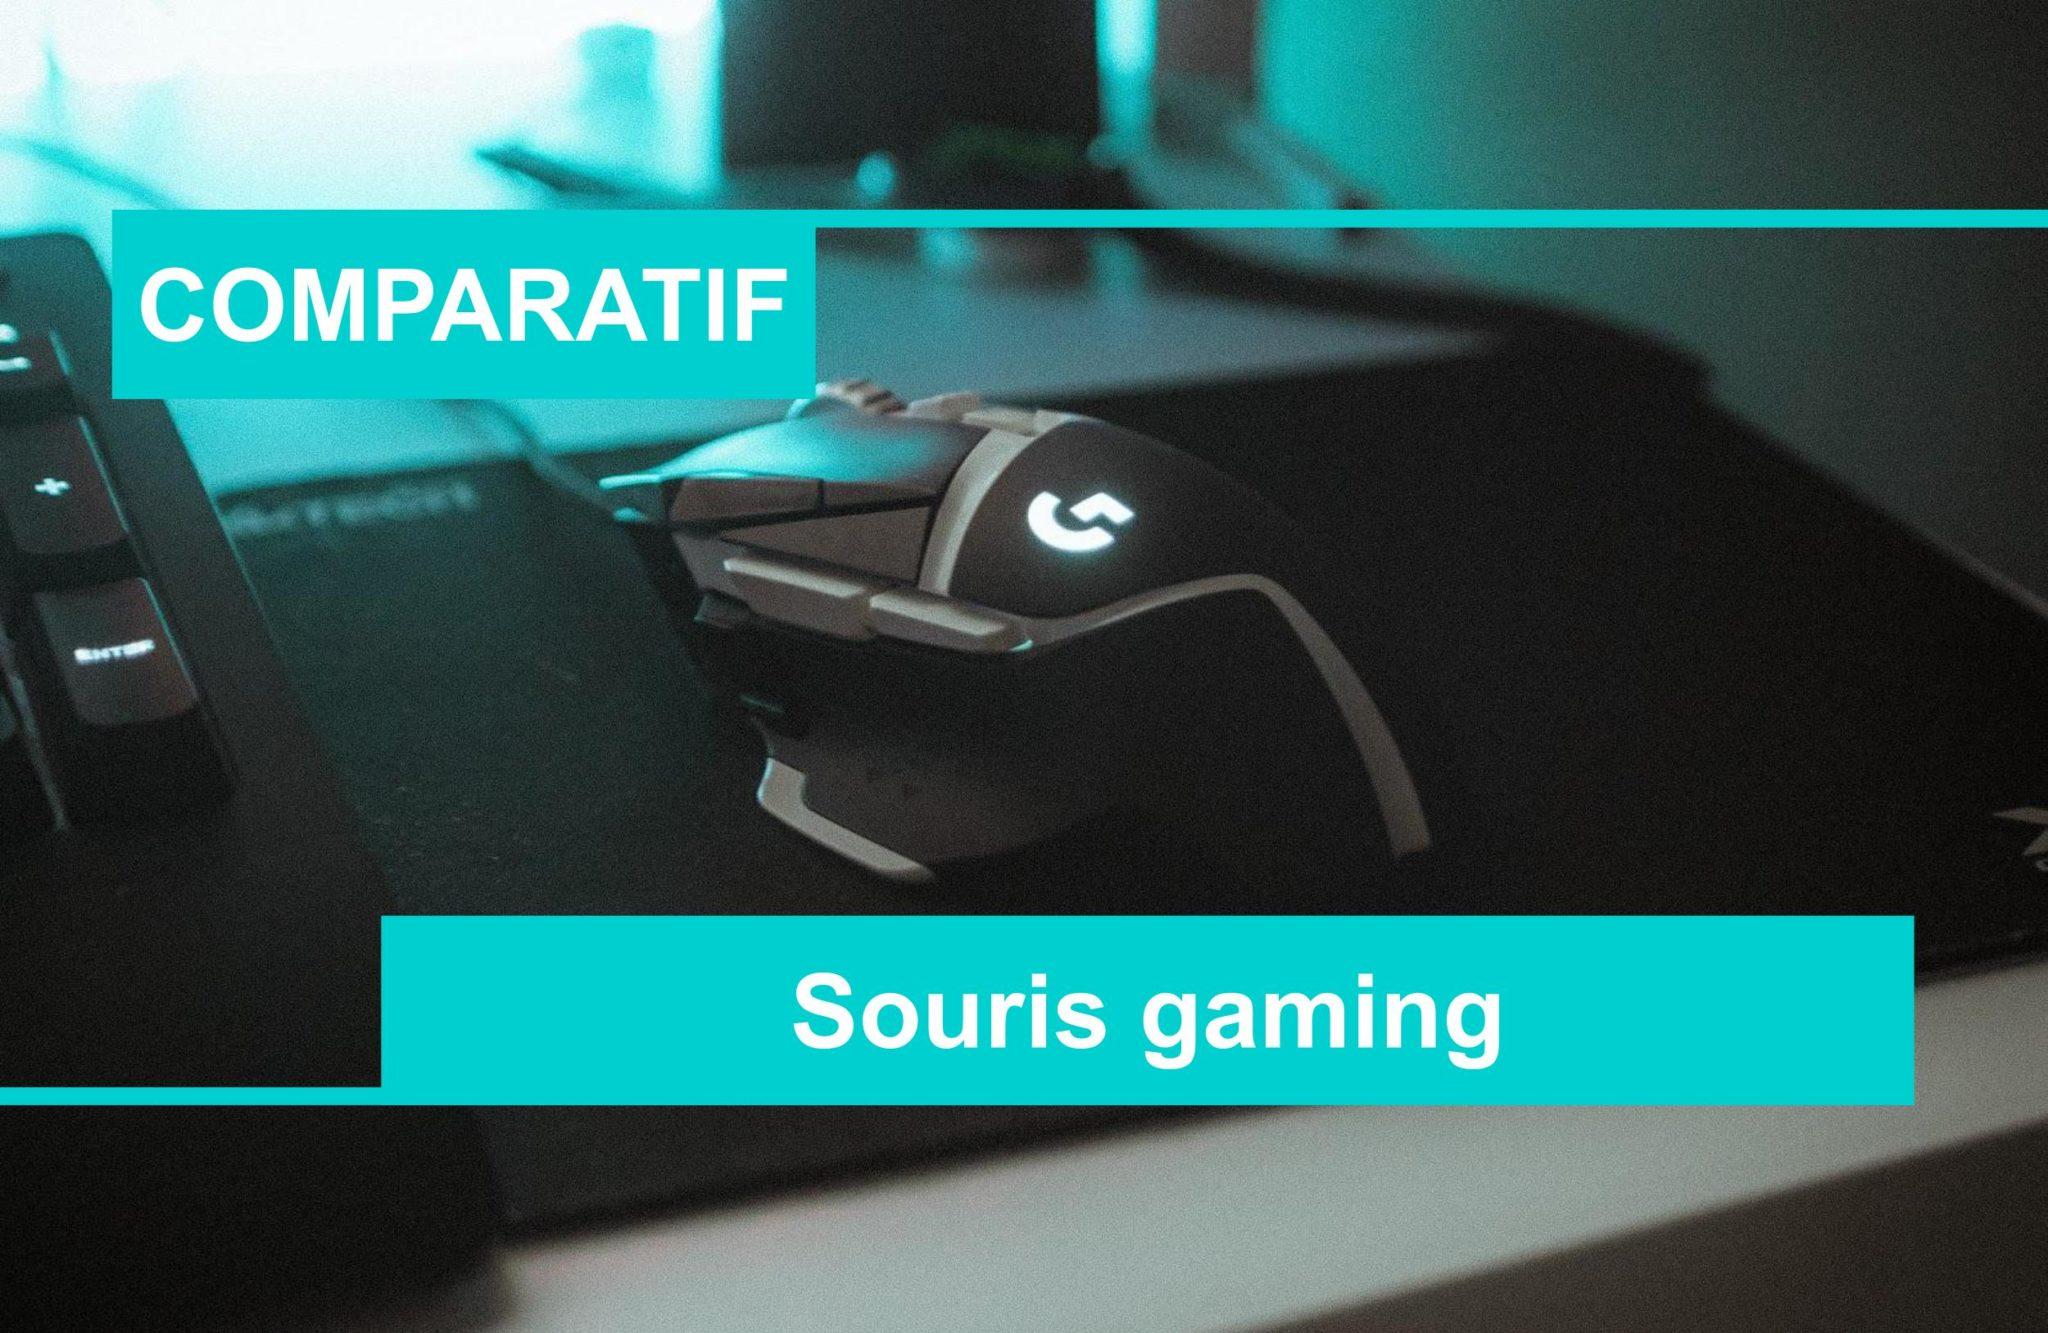 COMPARATIF meilleure souris gaming